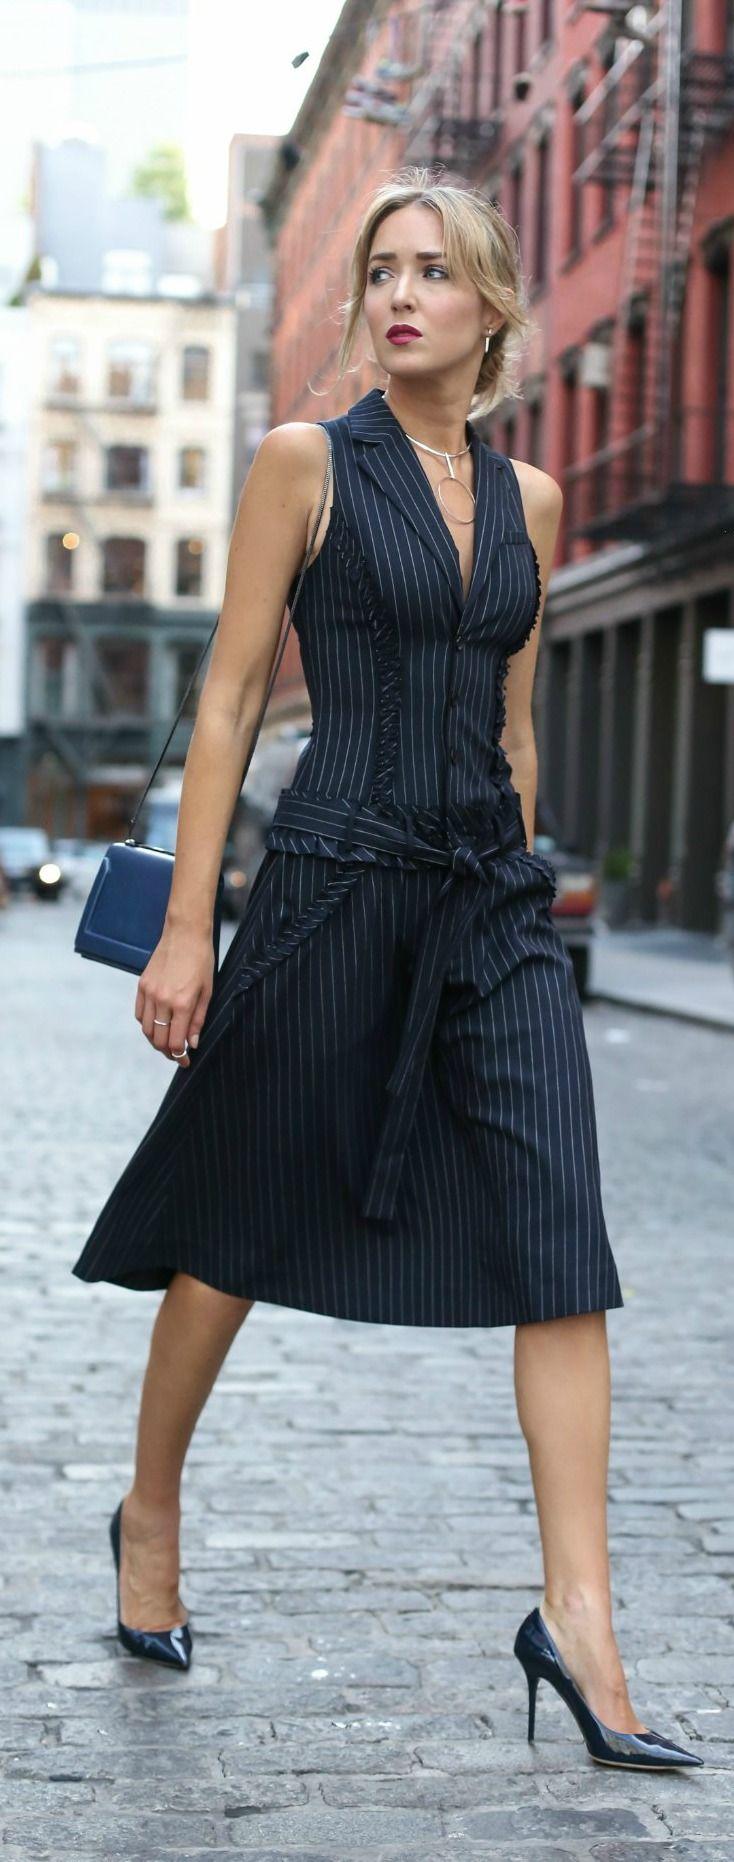 pinstripe drop waist dress, navy patent leather pumps, navy crossbody bag, silver statement necklace {marissa webb, jimmy choo, phillip lim, argento vivo}